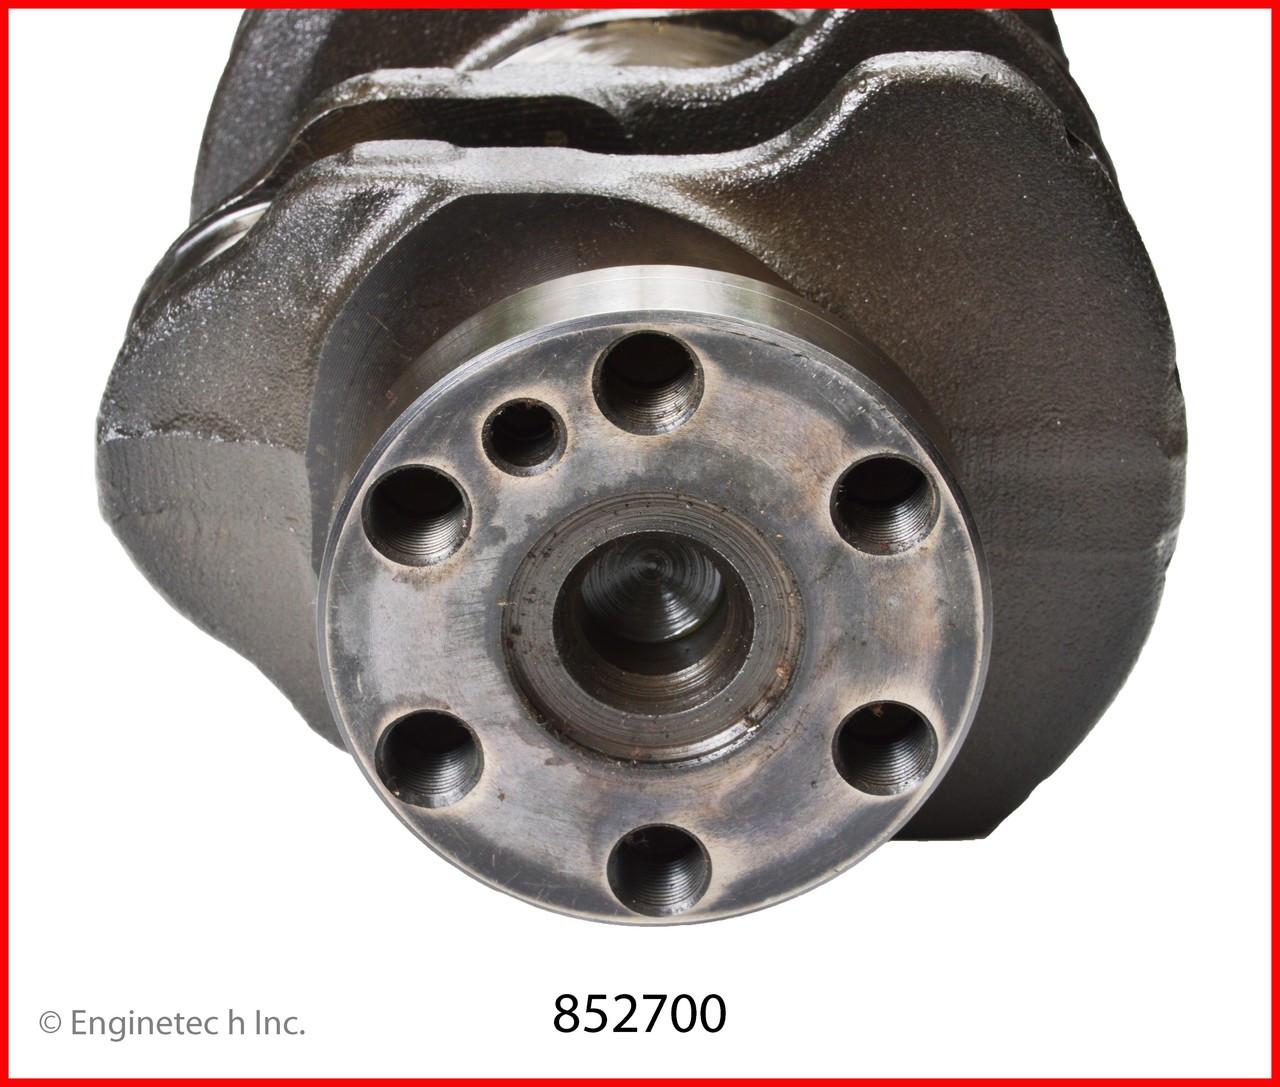 1995 Honda Civic del Sol 1.6L Engine Crankshaft Kit 852700 -15